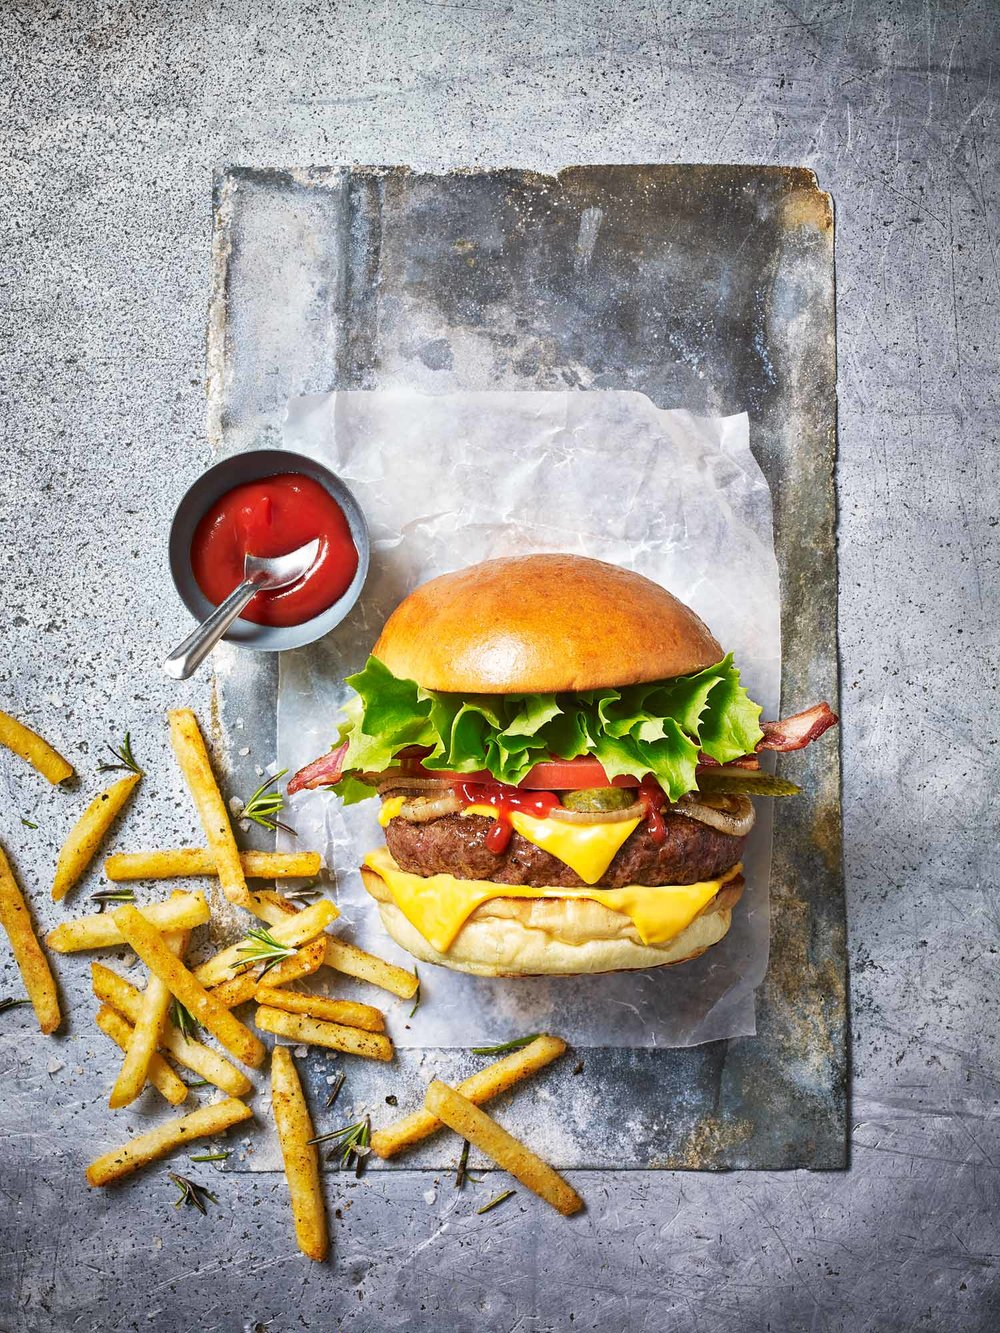 Stuart West - burger and chips